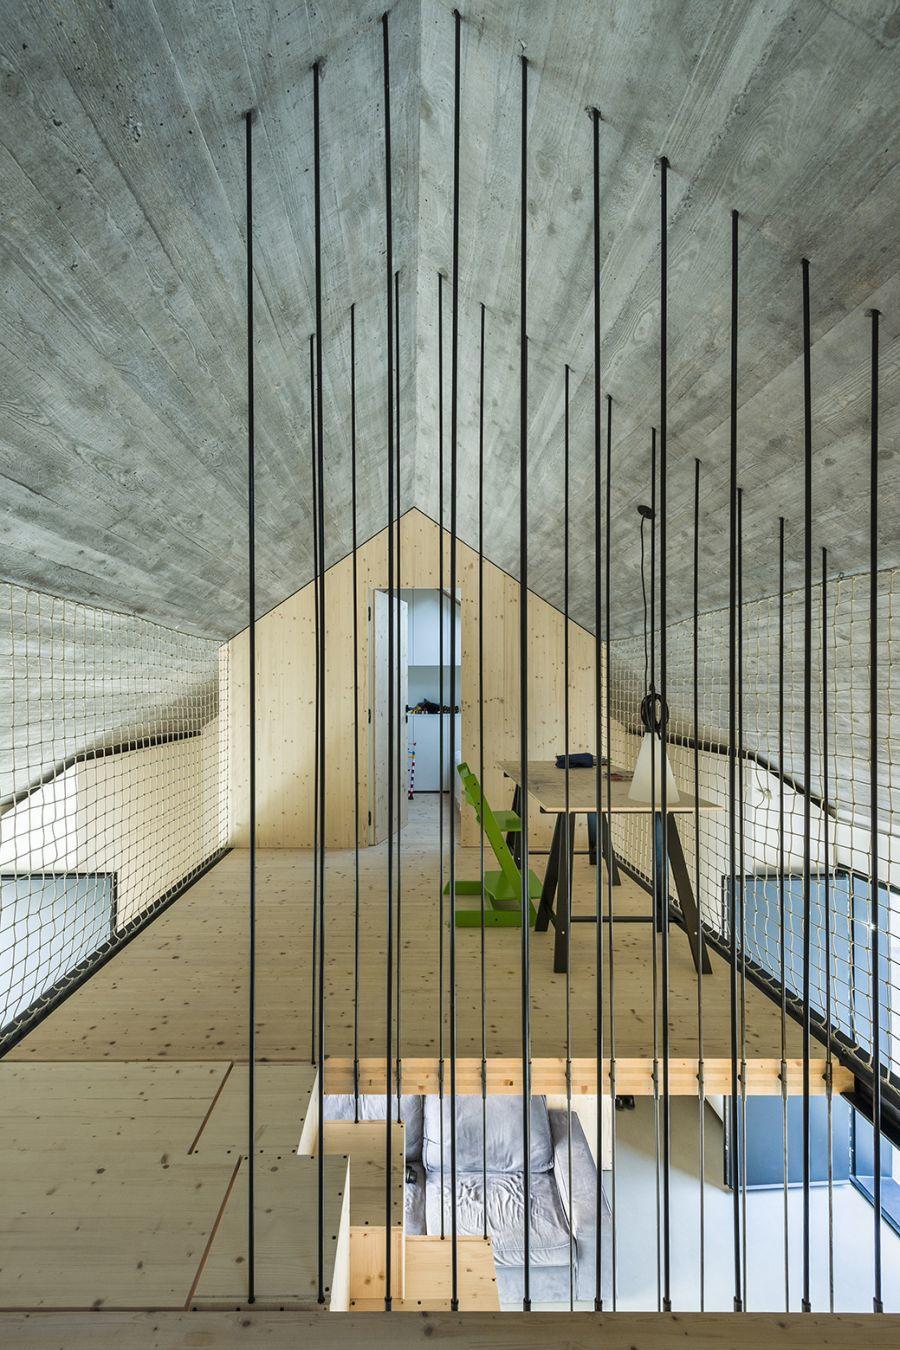 diaforetiko.gr : compact karst house dekleva gregori arhitekti upstrairs Εκπληκτικό! Εξοχικό σπίτι συνδυάζει άψογα την παραδοσιακή με τη μοντέρνα αρχιτεκτονική!!